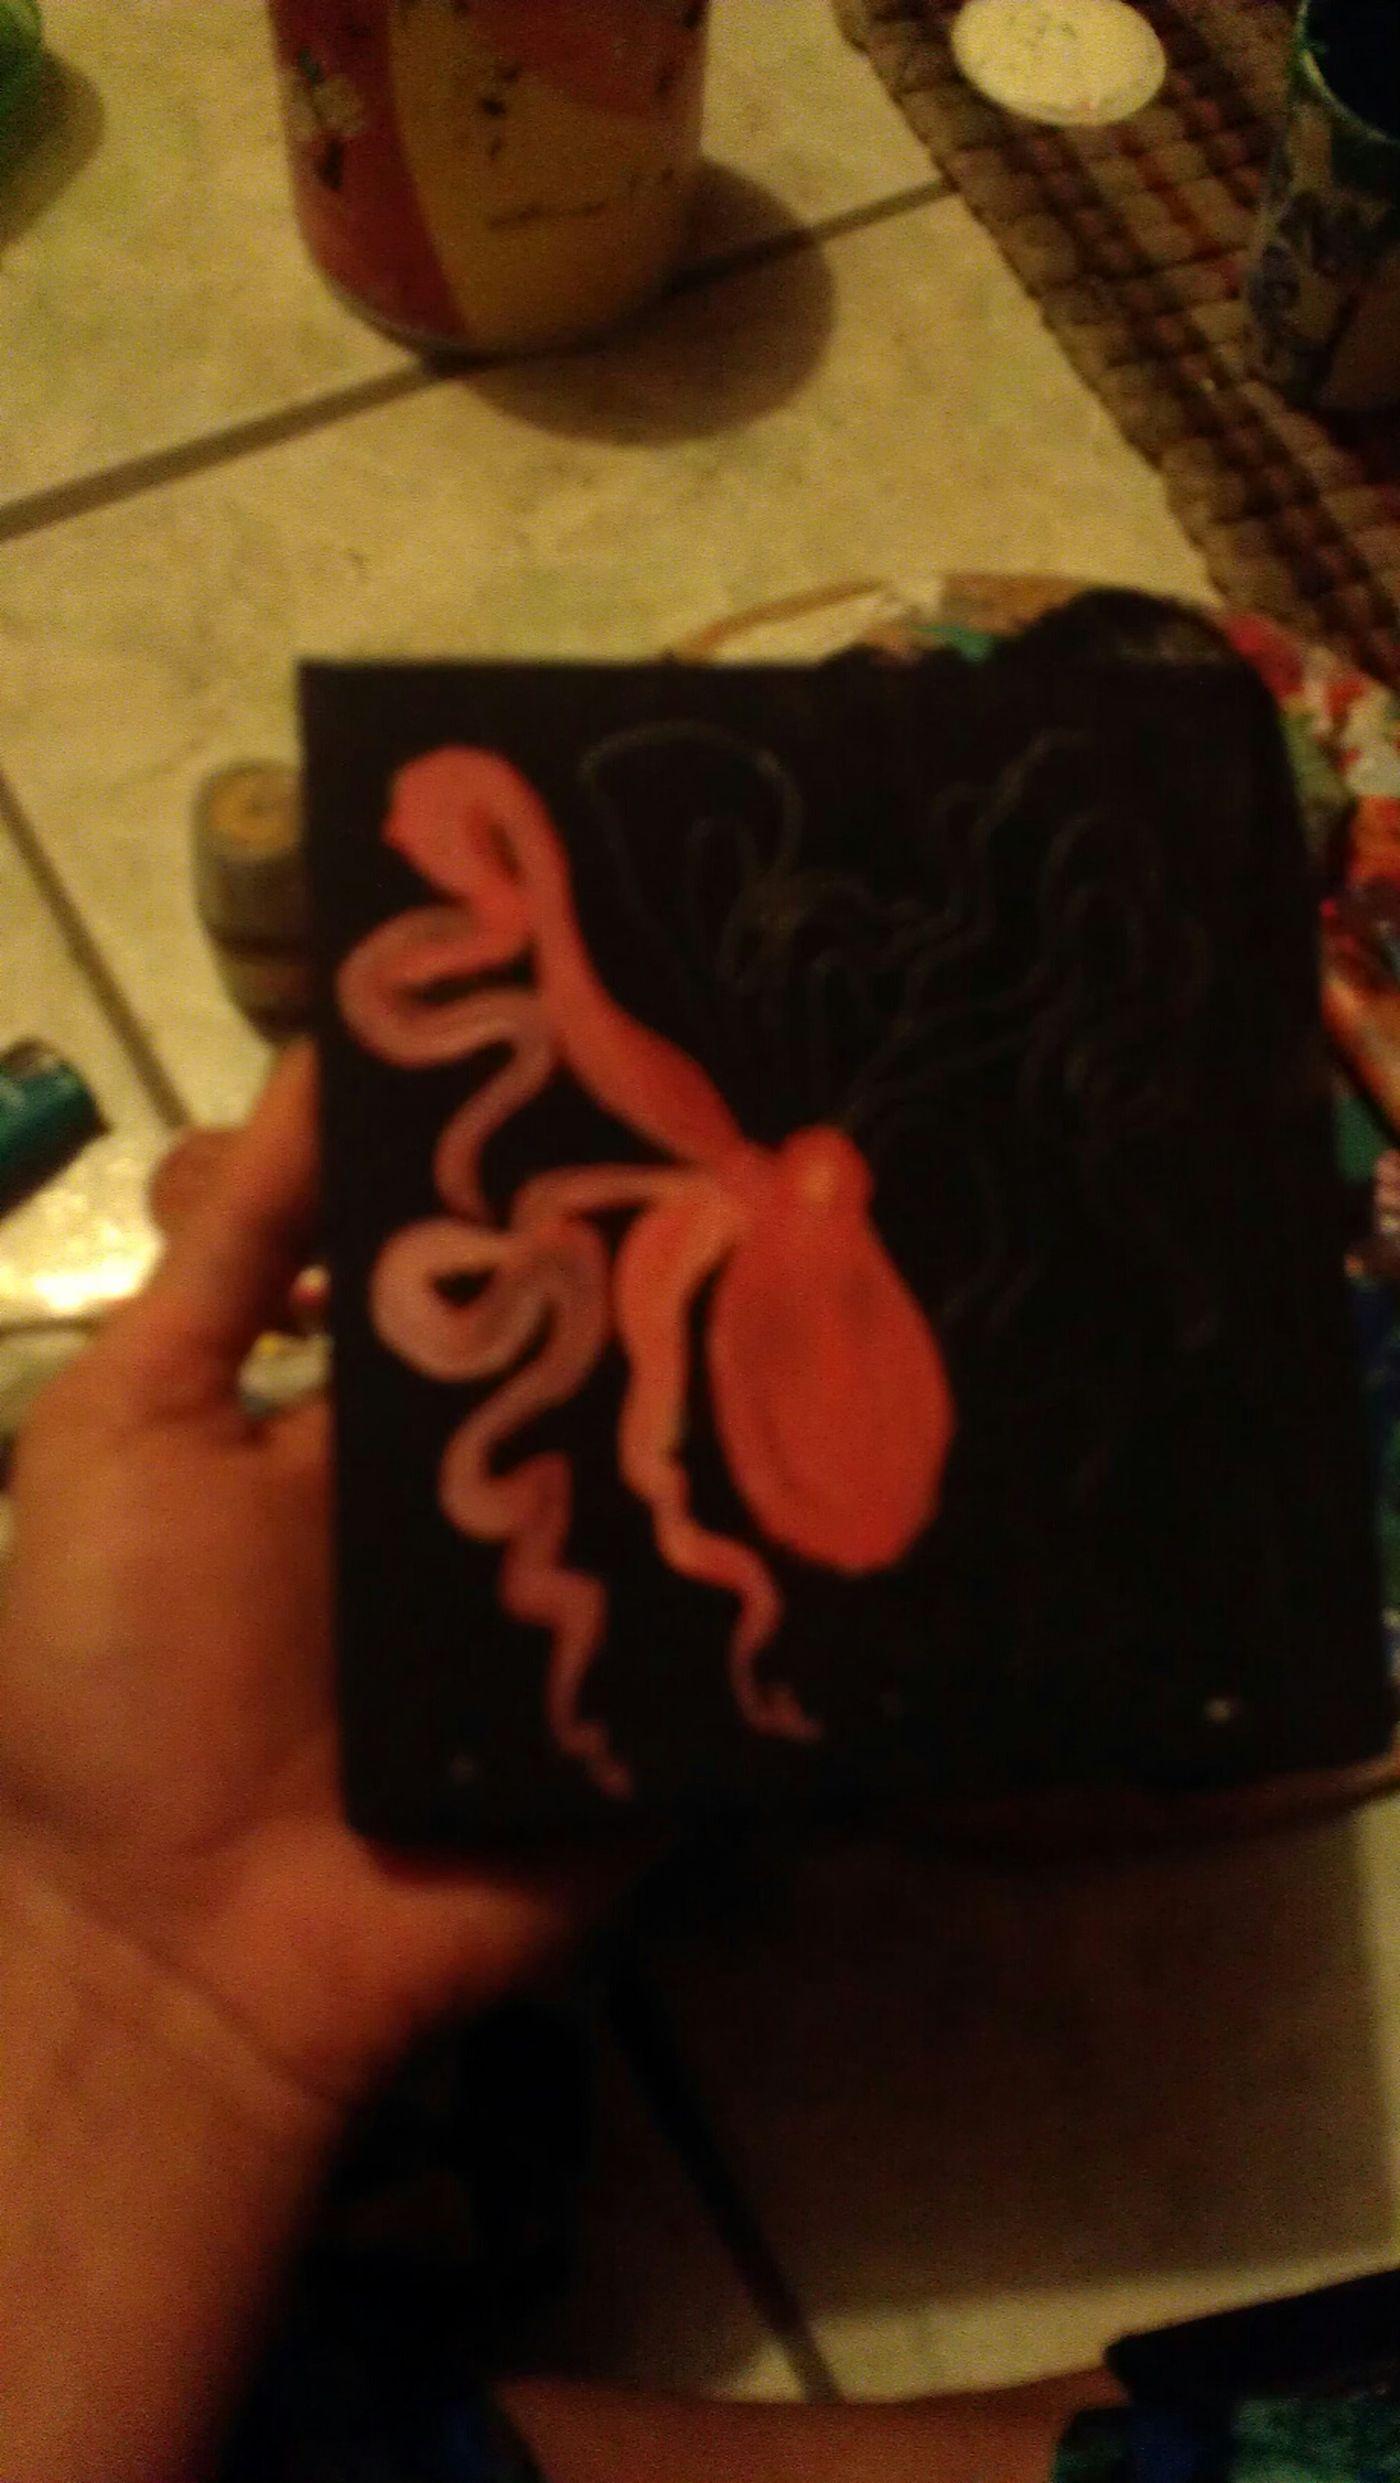 OCTOPUSSY Art Painting Octopus Acrilic Relaxing Time UrbanART Black Unstressing My Painting Enjoying Life